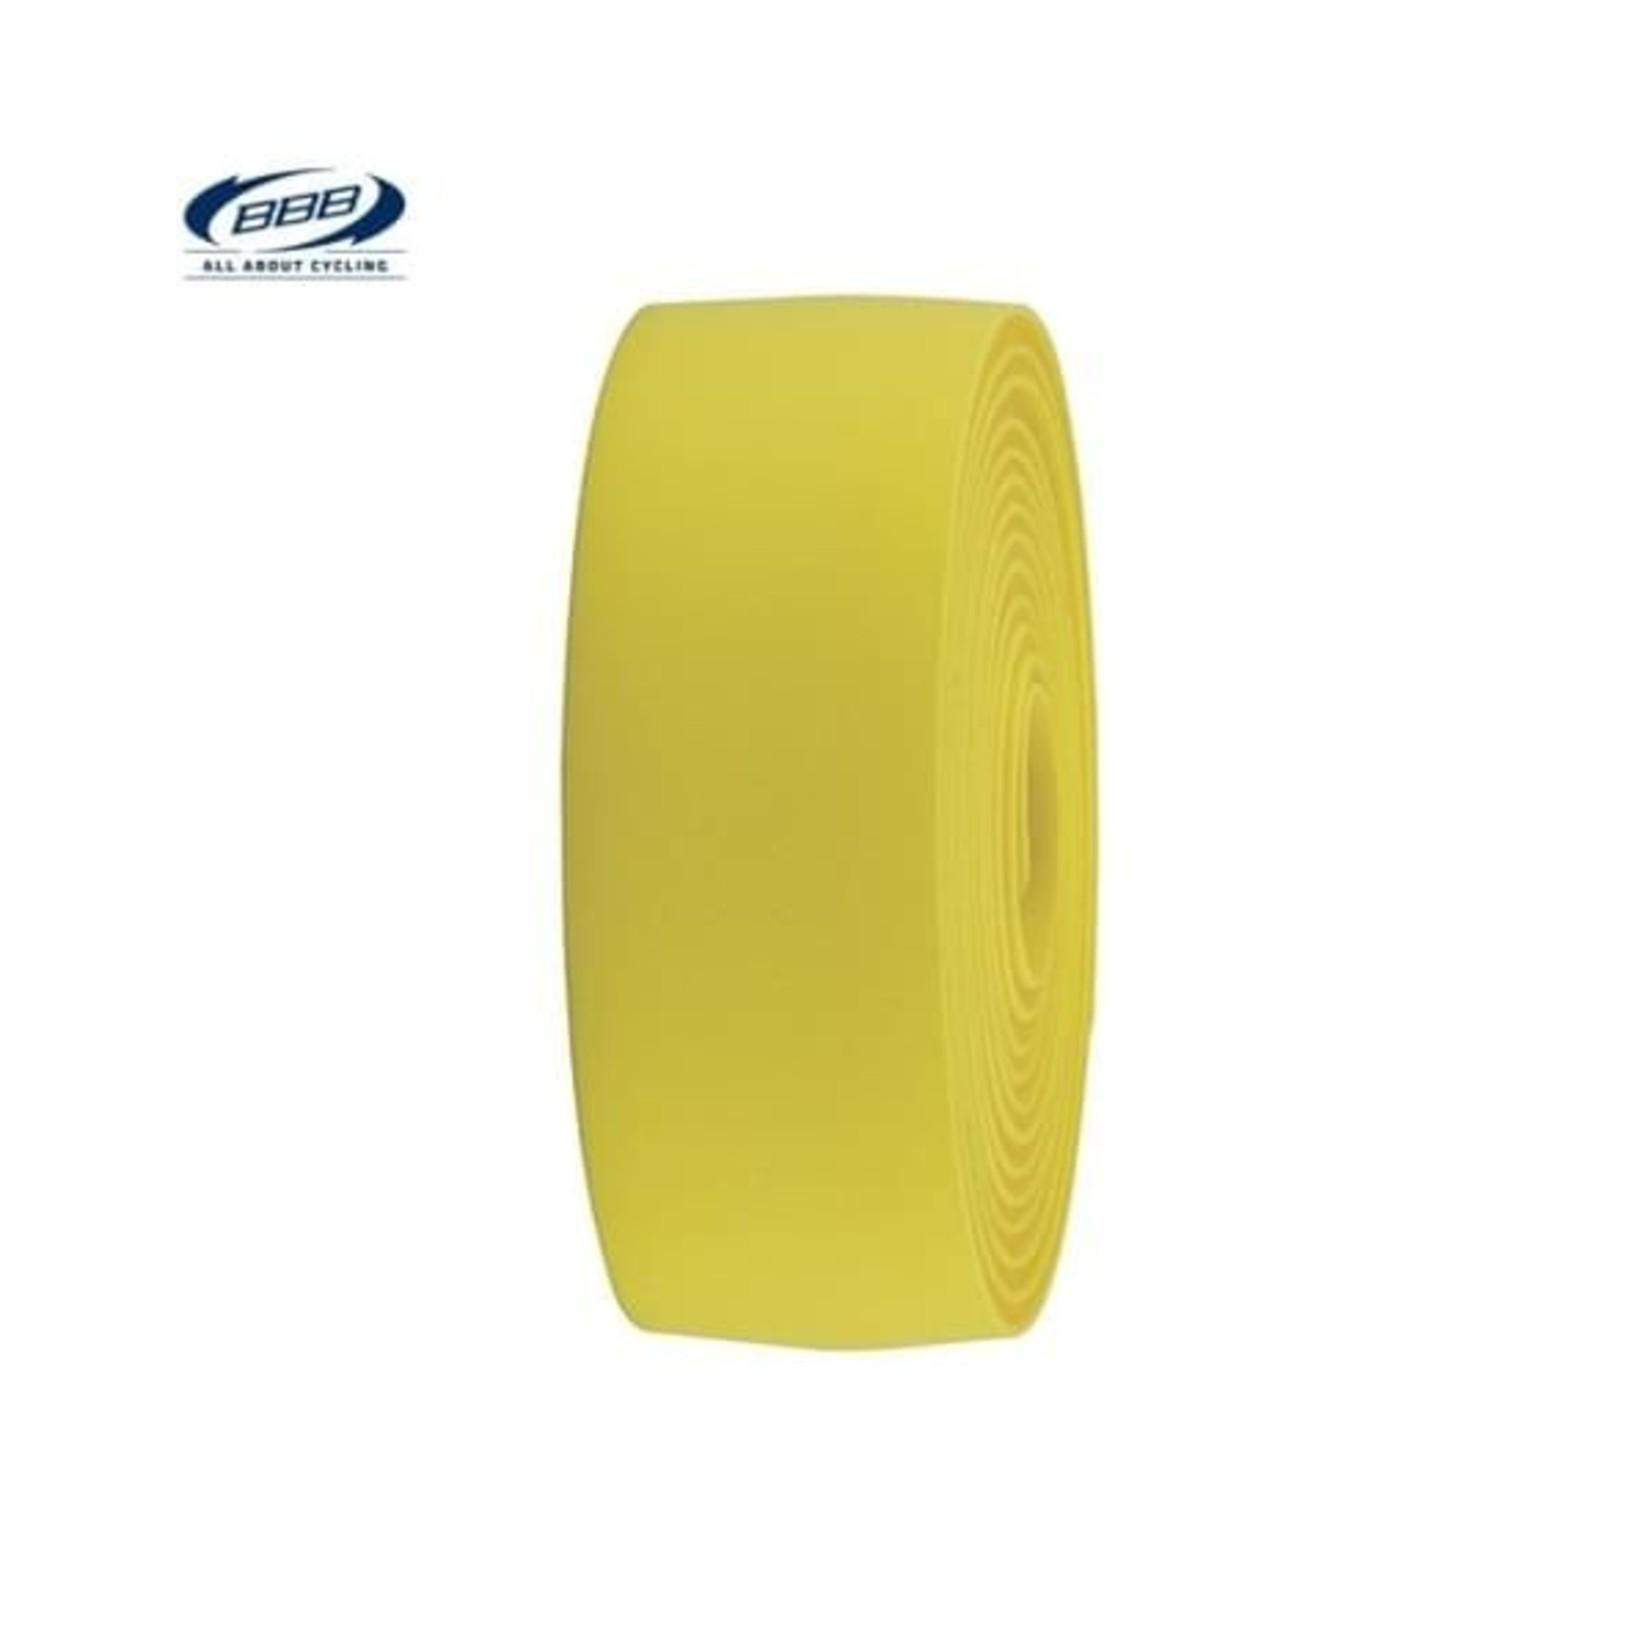 BBB Handlebar Tape - RaceRibbon - Yellow